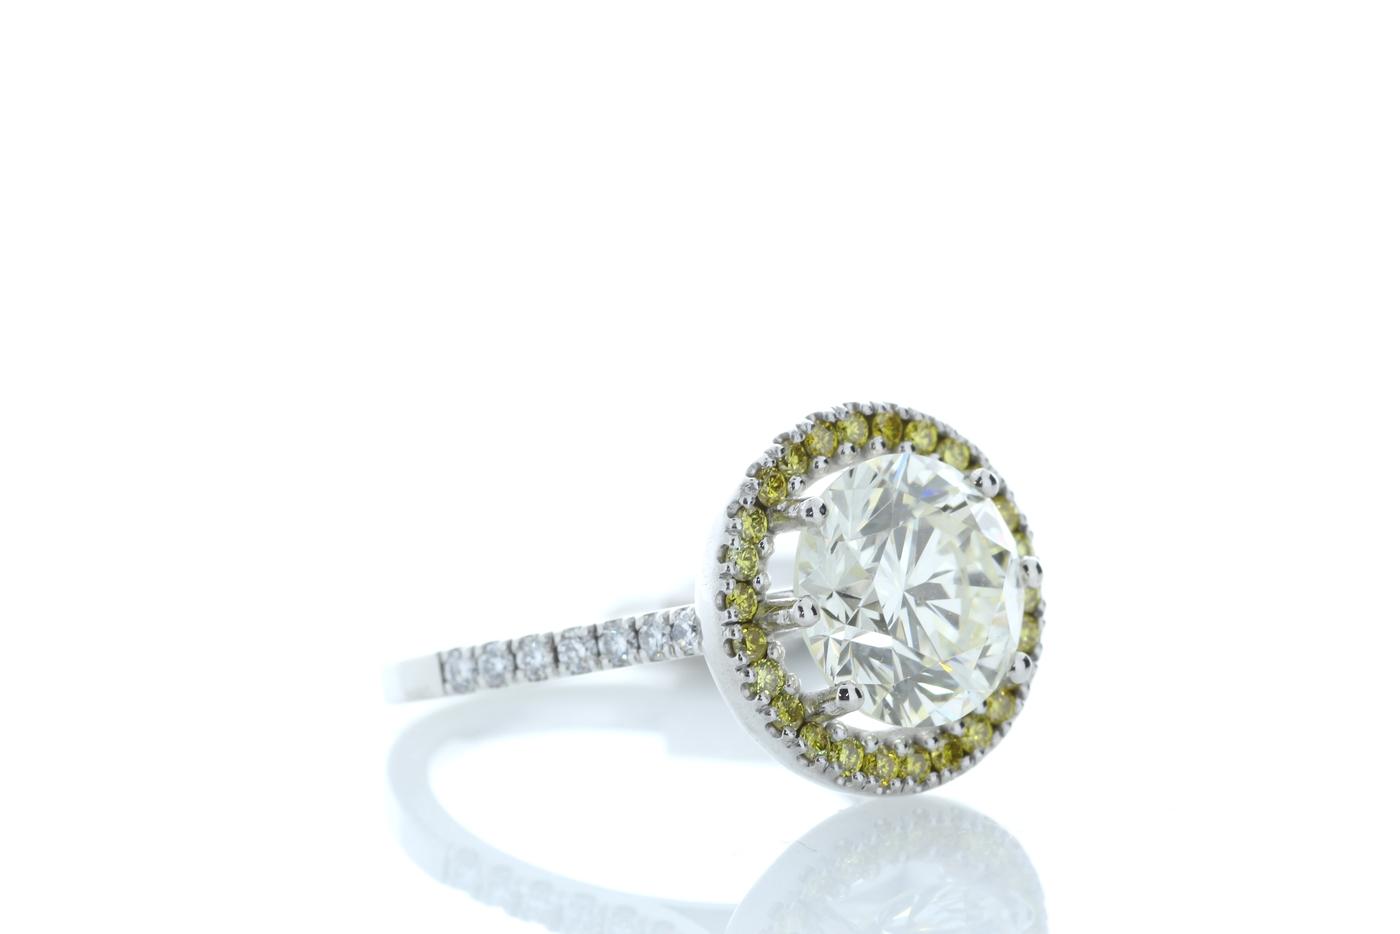 18ct White Gold Halo Set Diamond Ring 3.43 Carats - Image 4 of 5